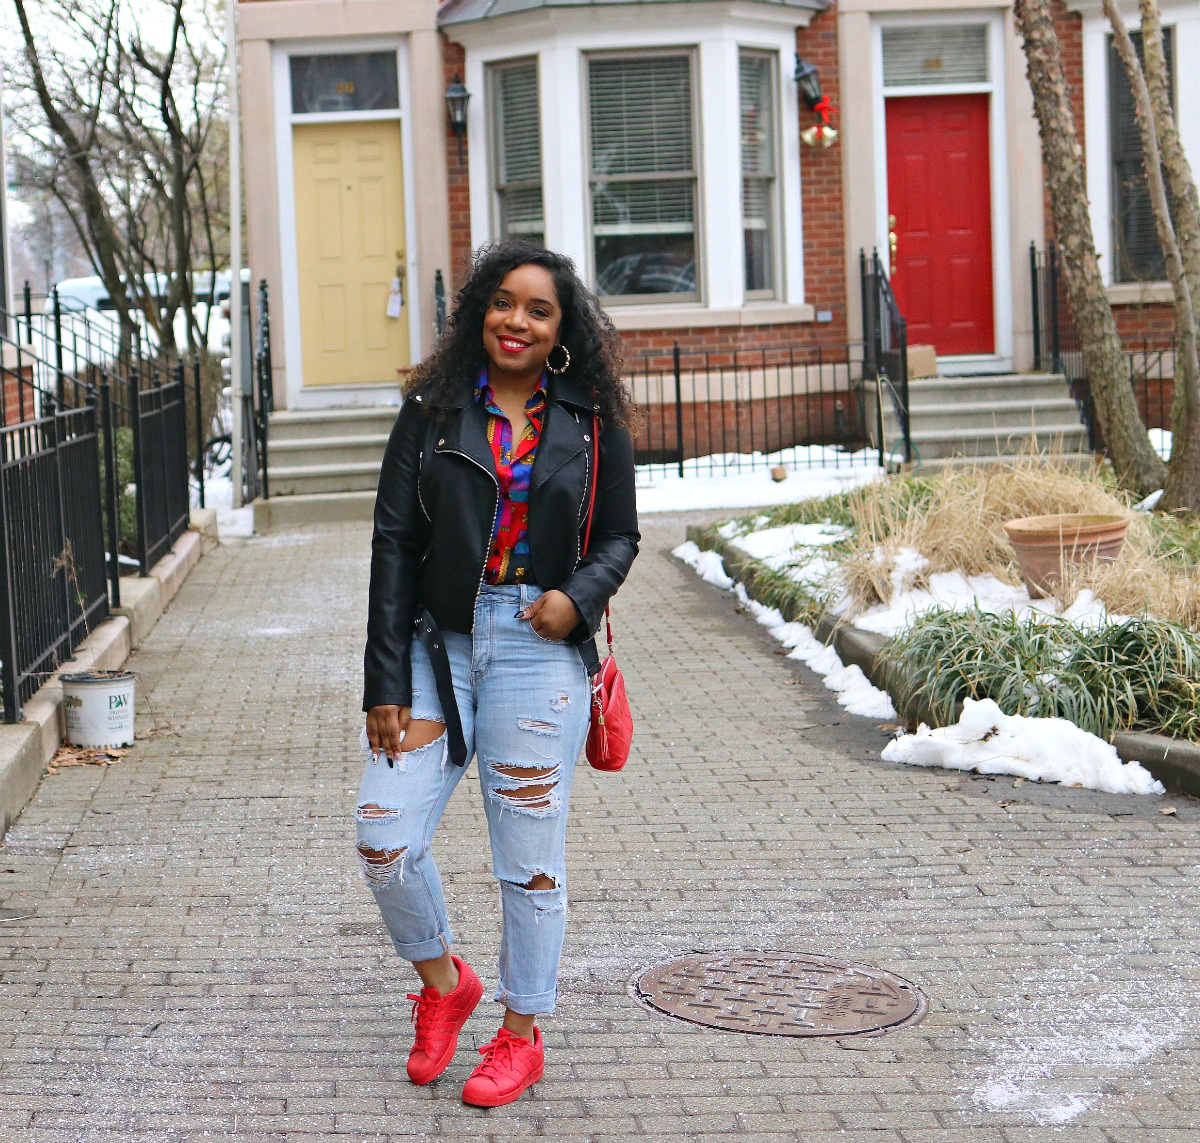 Style & Poise-Vintage Versace Inspired blouse, moto jacket, shell toe adiddas, bamboo earrings, street style